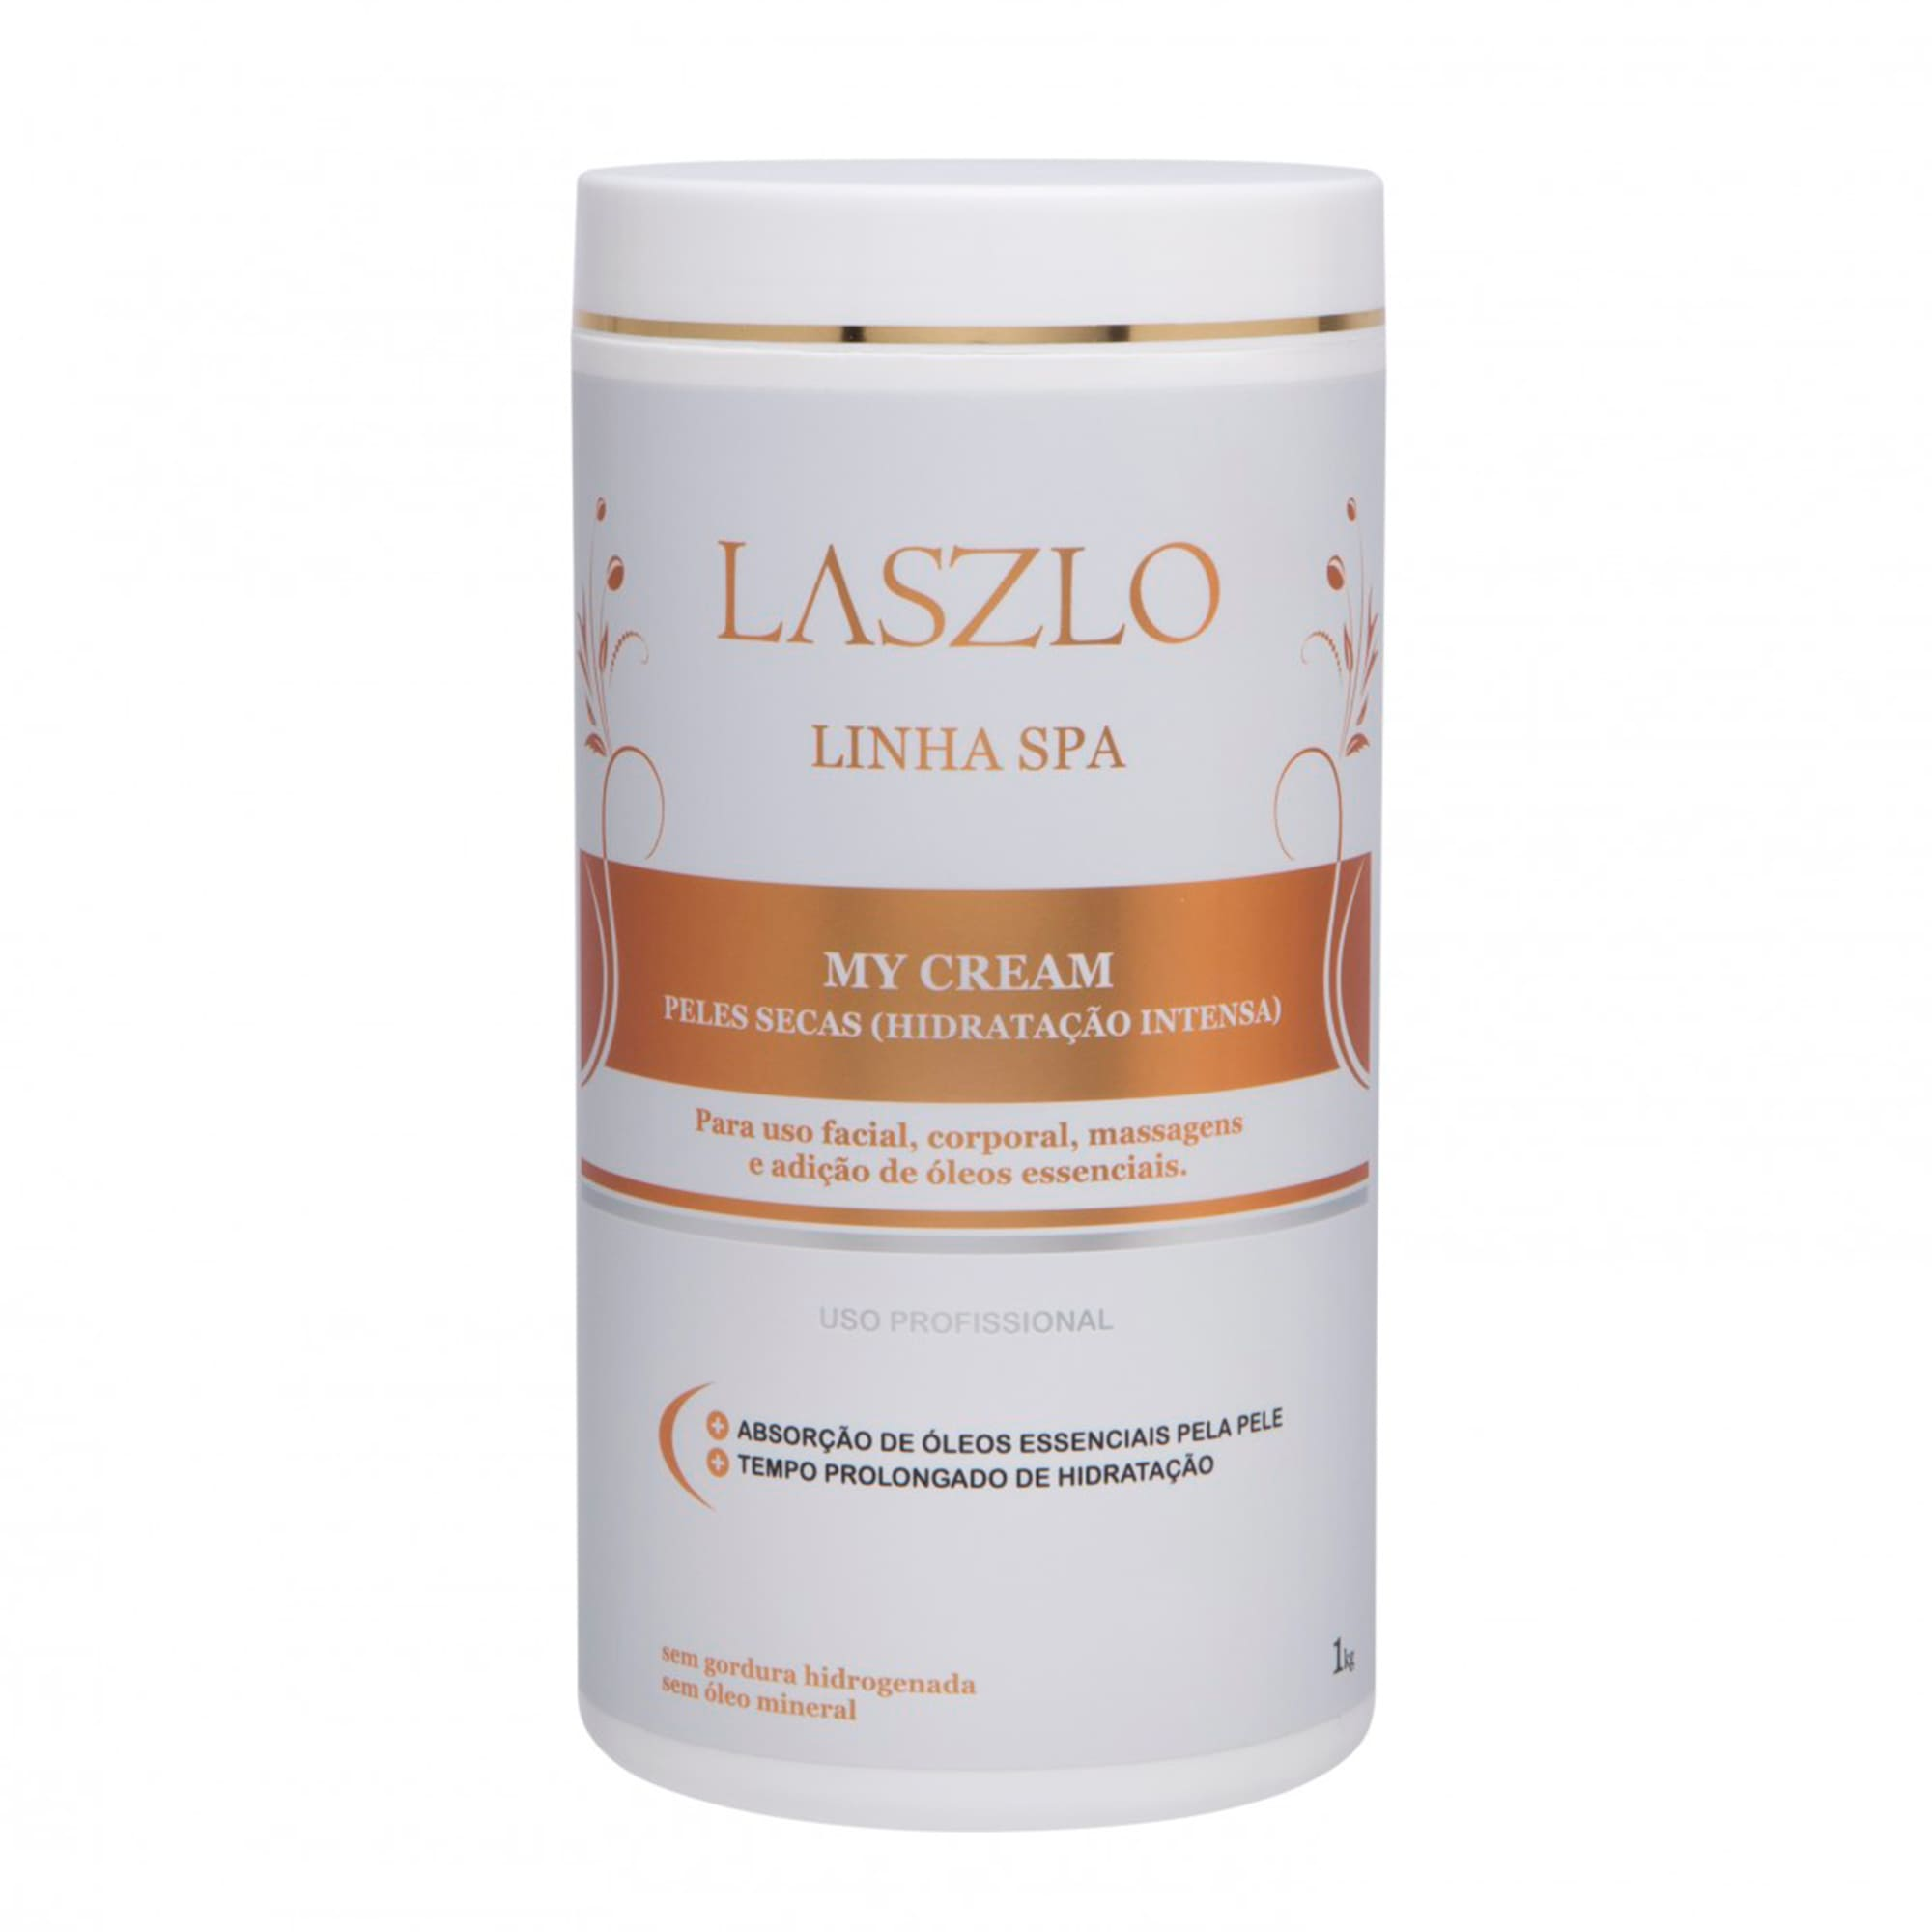 Creme Base My cream (Peles Secas) 1kg - Laszlo